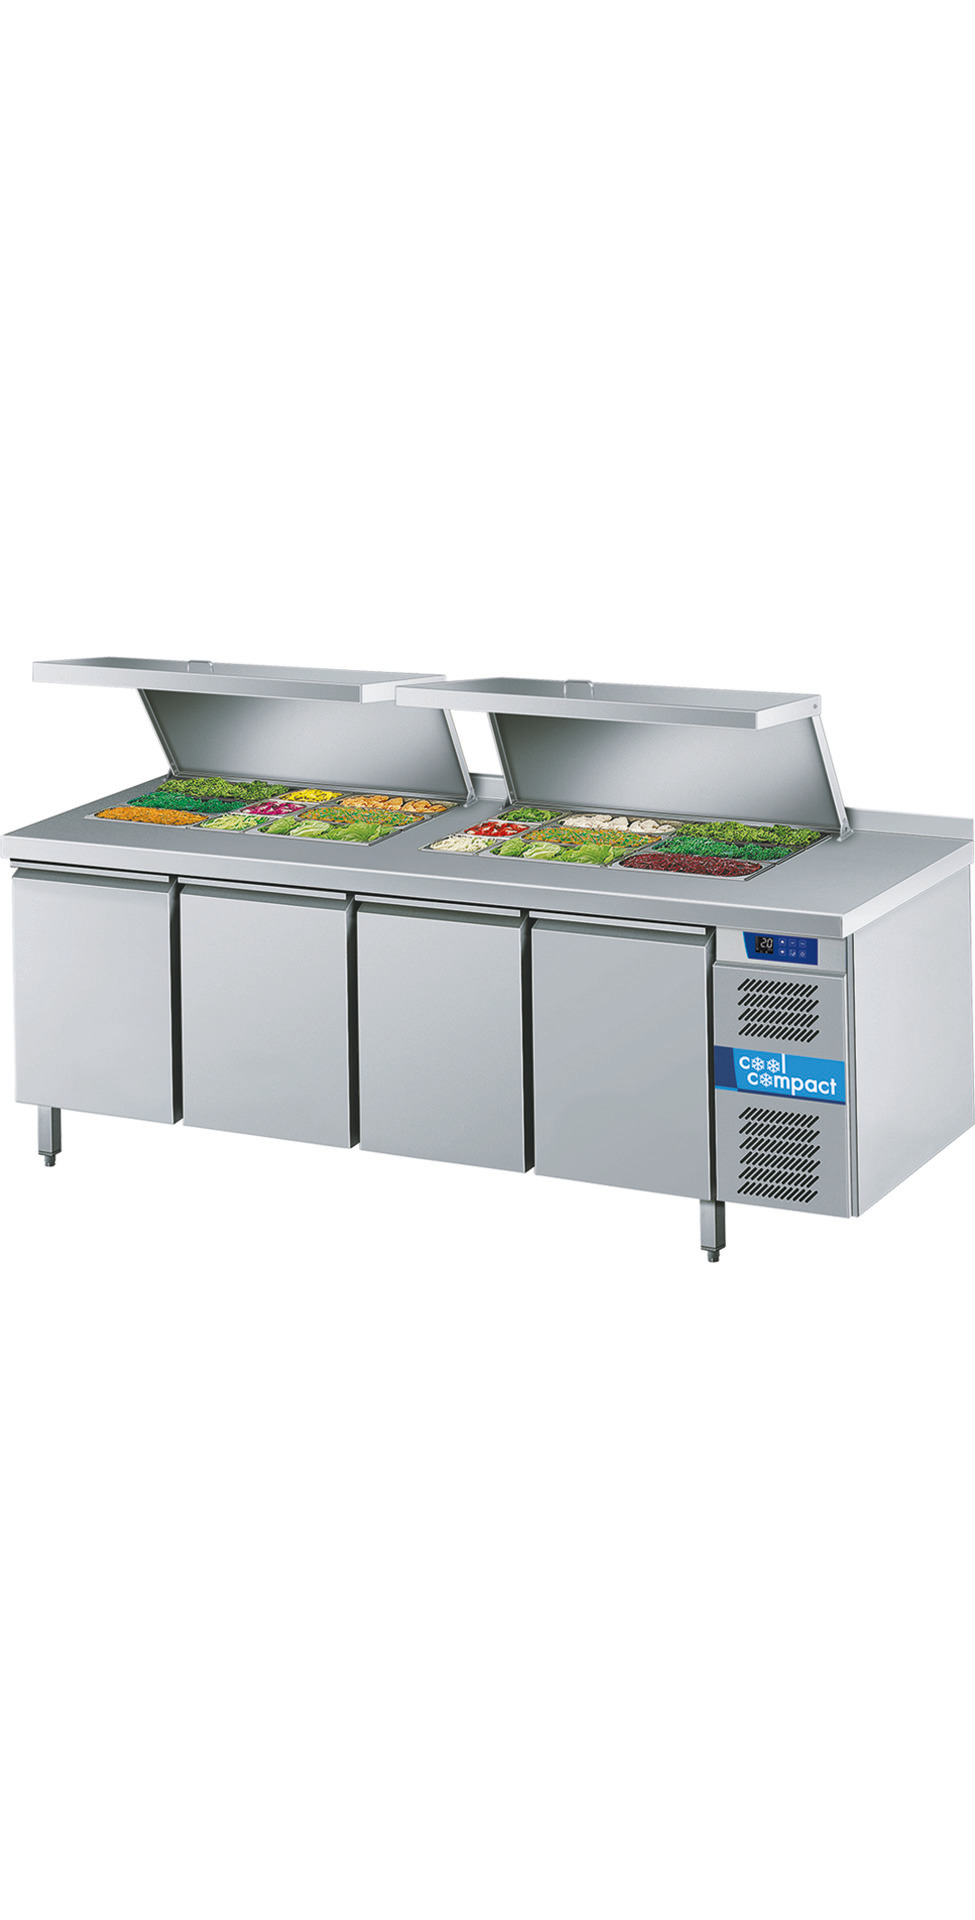 Saladette 4 Türen je 10 x GN 1/1 /  ohne Tischplatte / zentralgekühlt